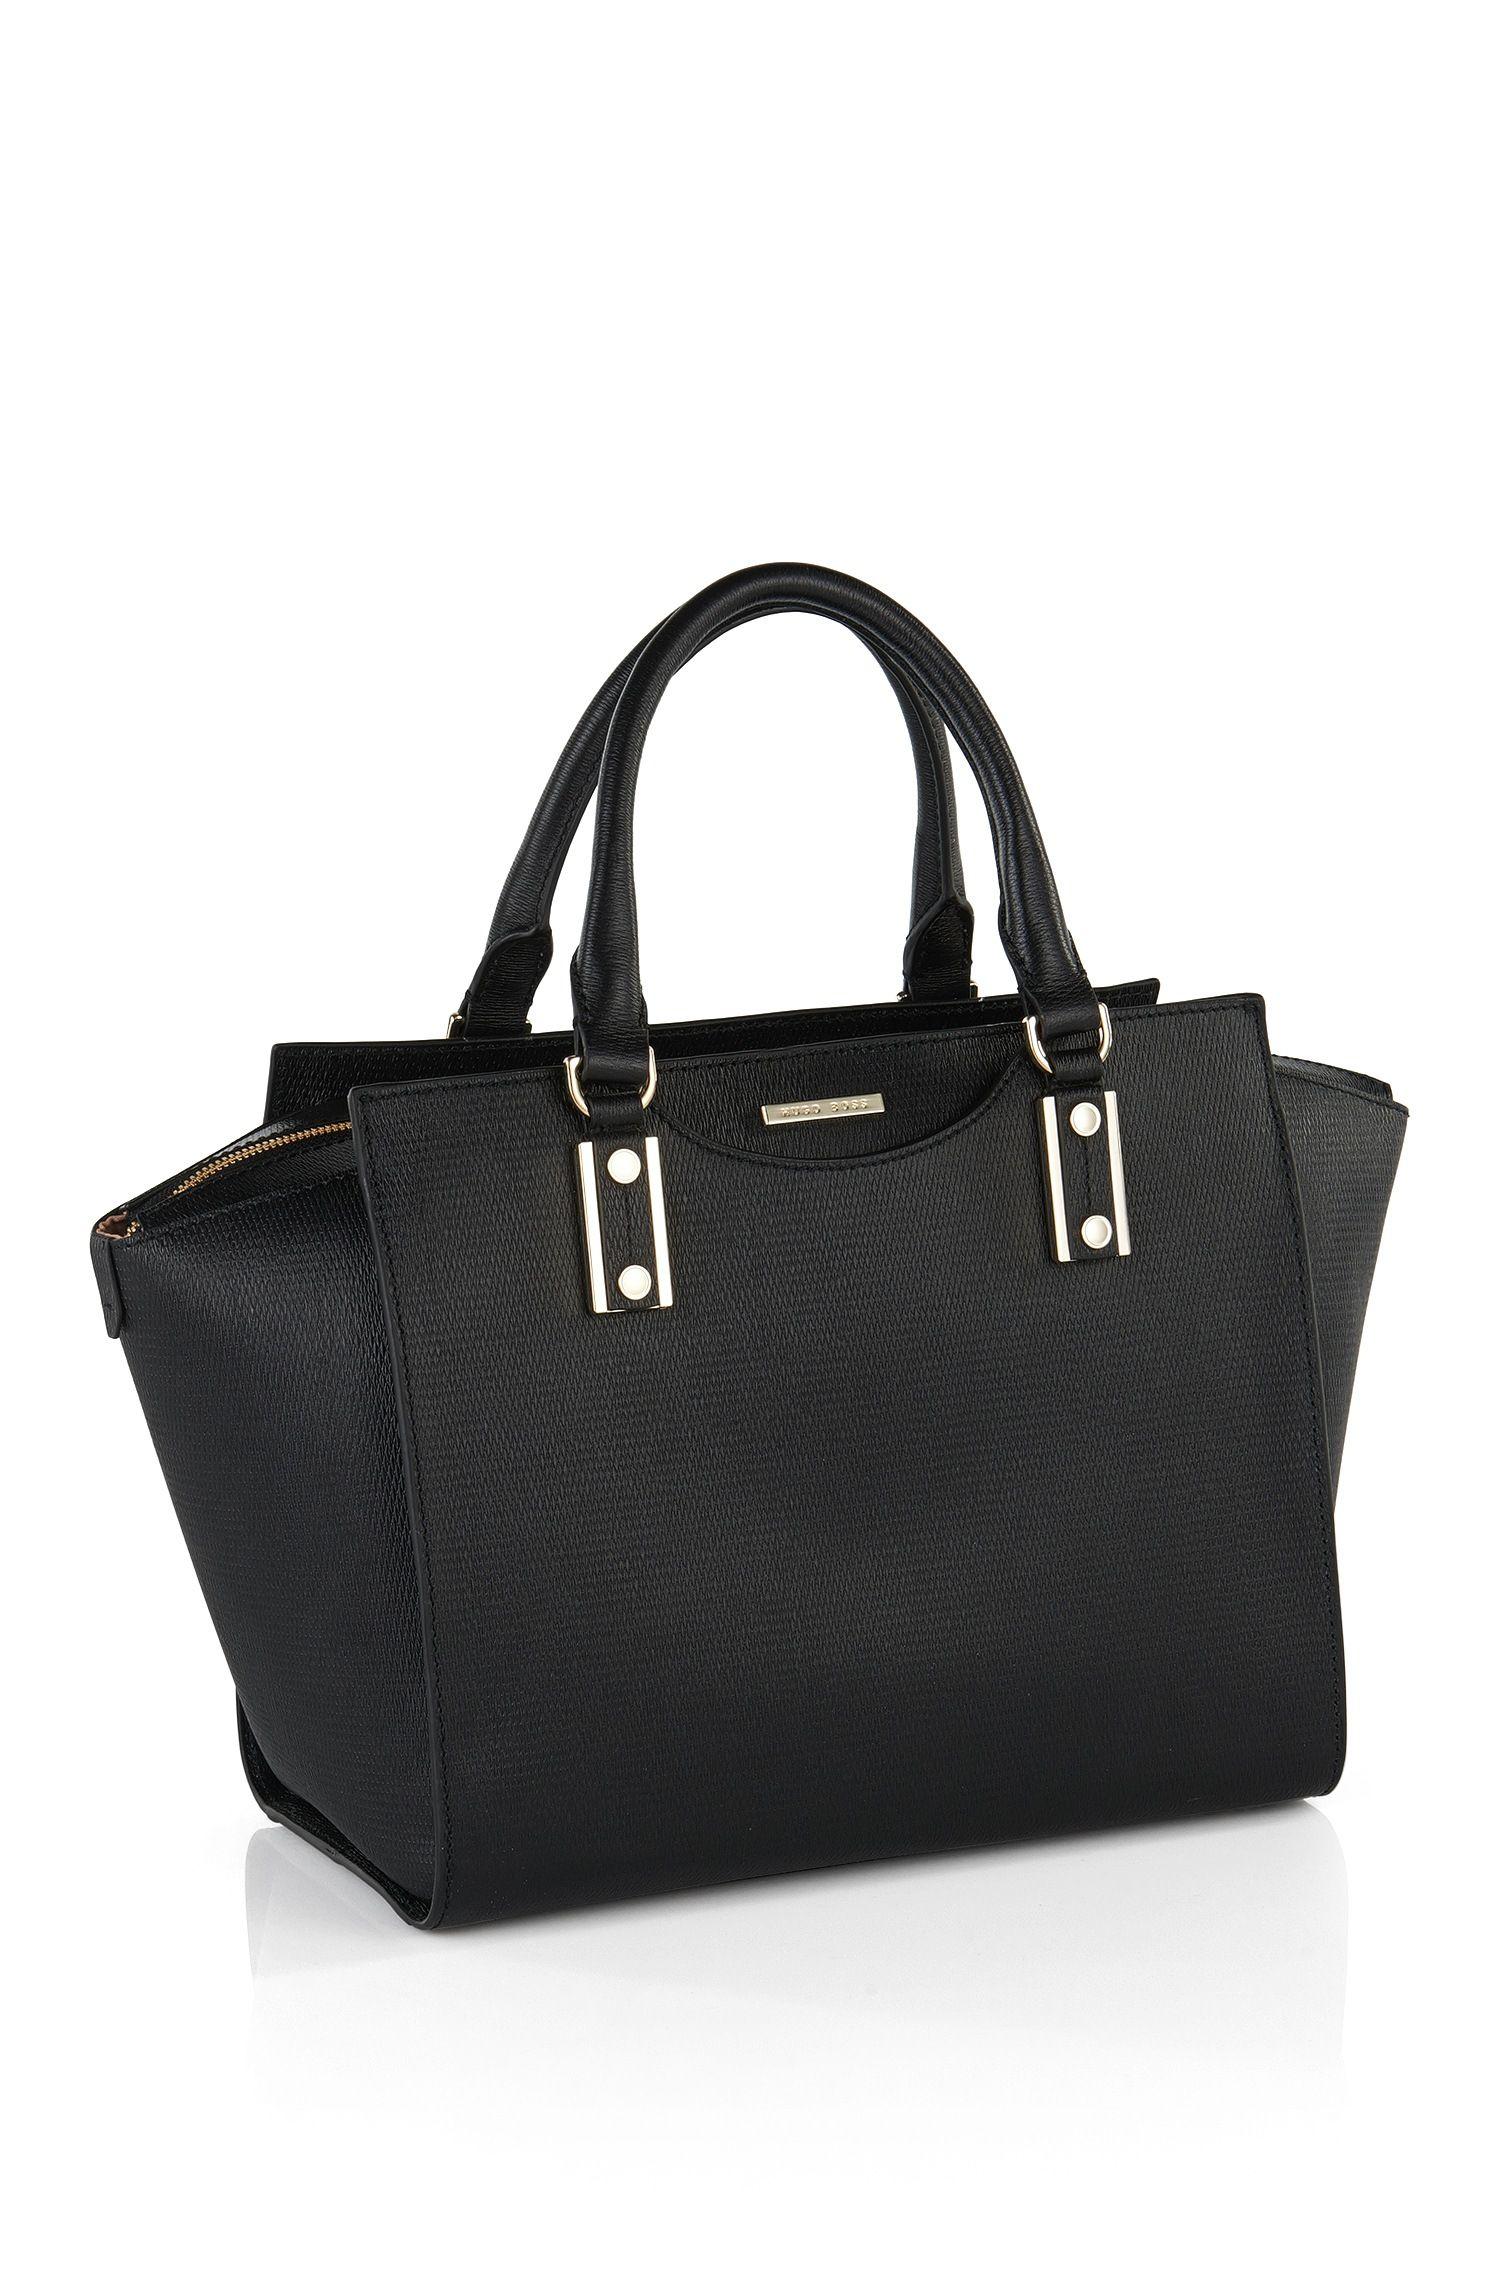 sac main en cuir maika f bags pinterest bag guess bags and black handbags